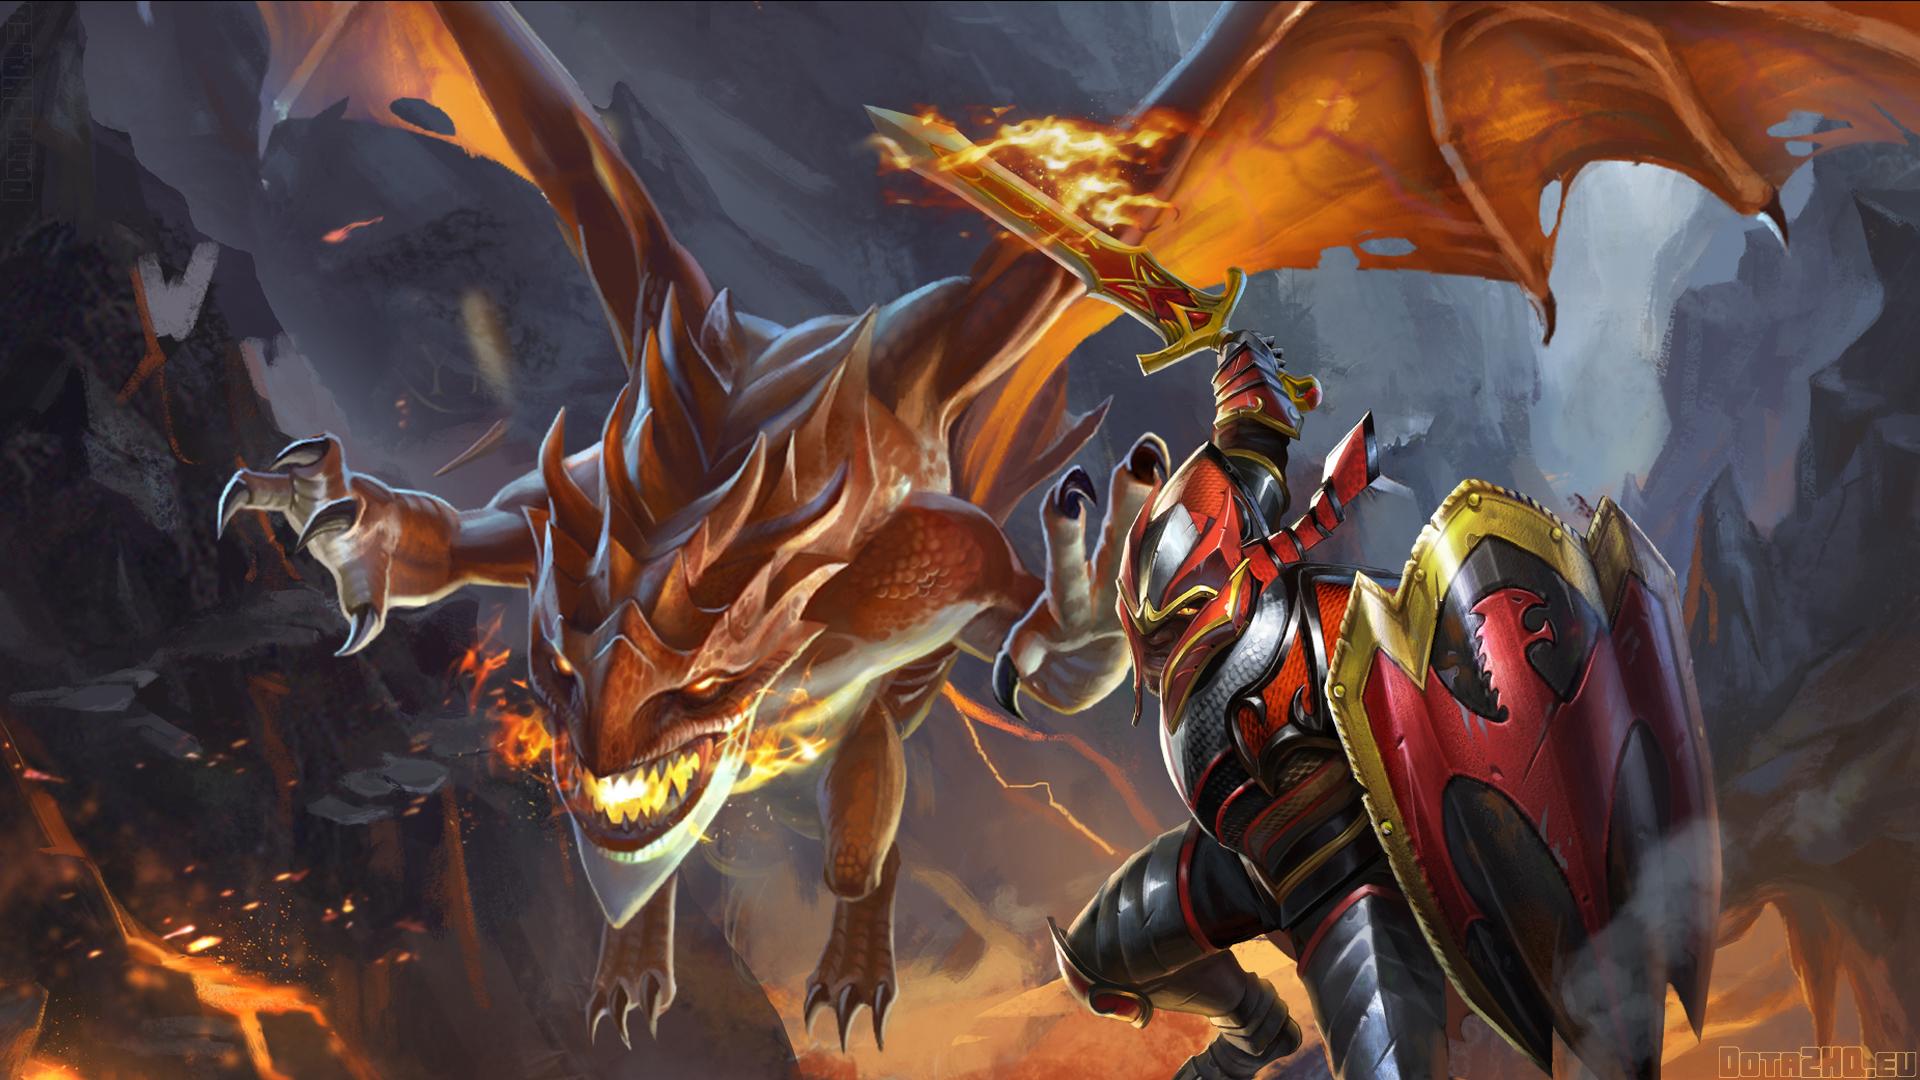 Davion Dragon knight Dota 2 Wallpaper Background Full HD 1080p 1920x1080